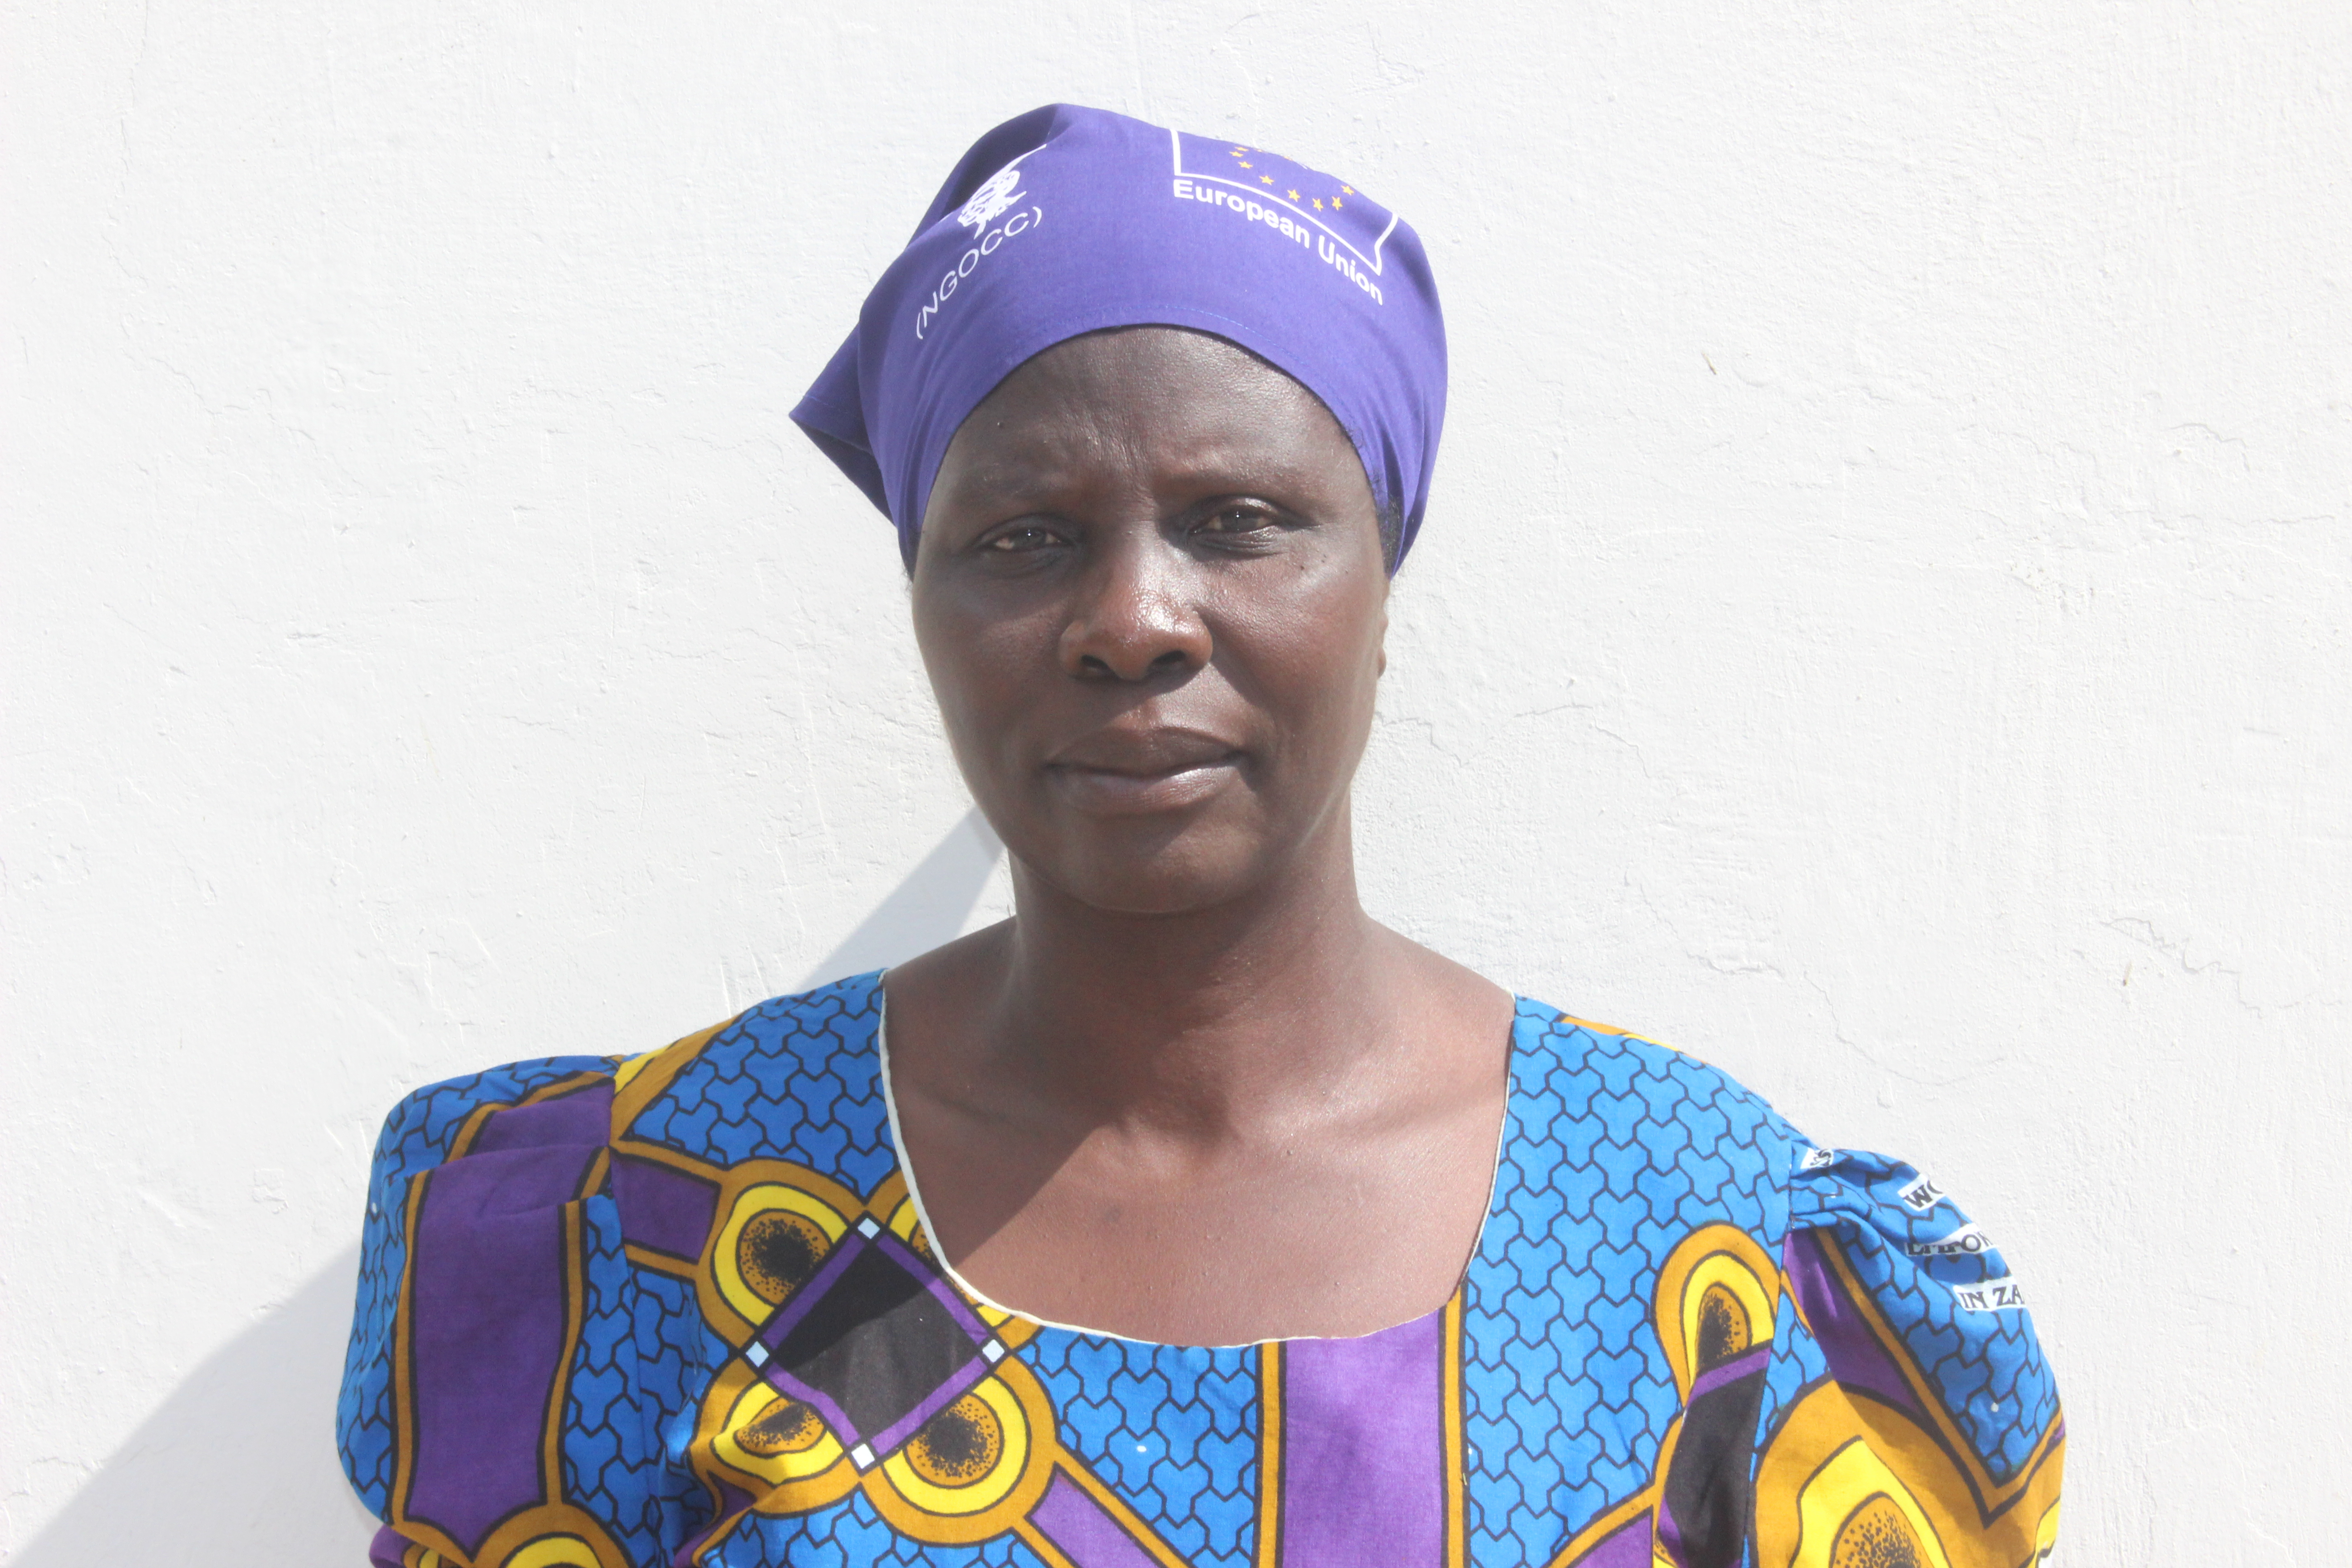 Ms. Judith Mwanza